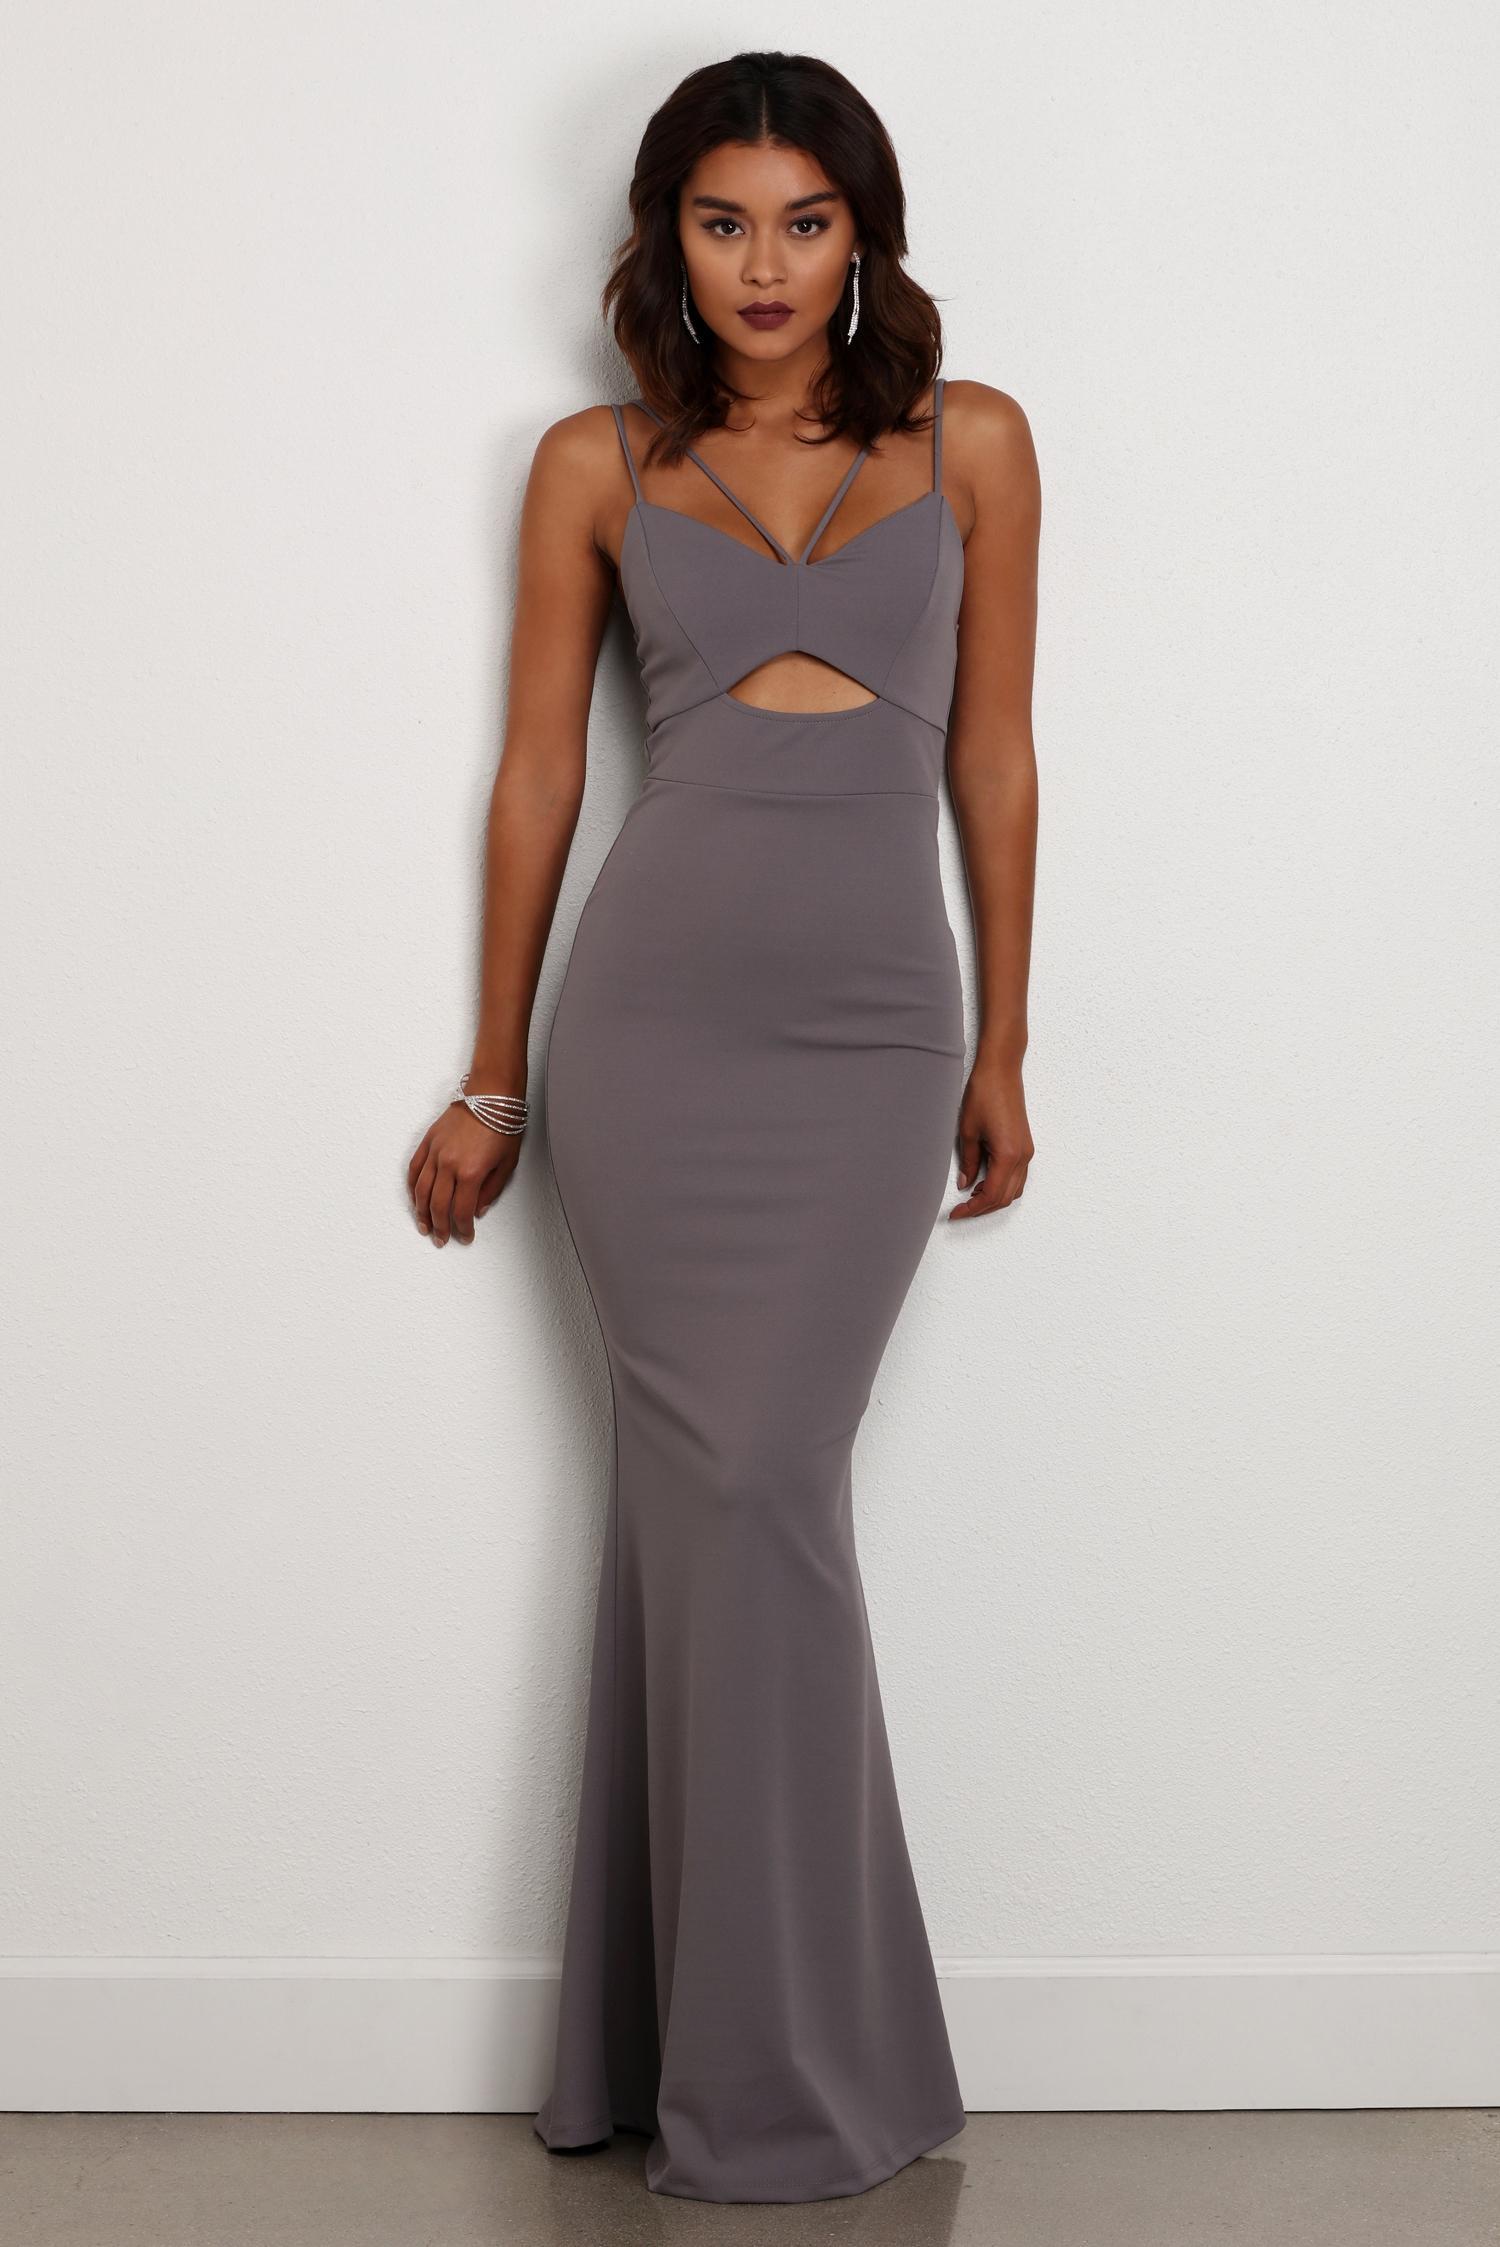 kara gray cut out formal dress COUNCYW